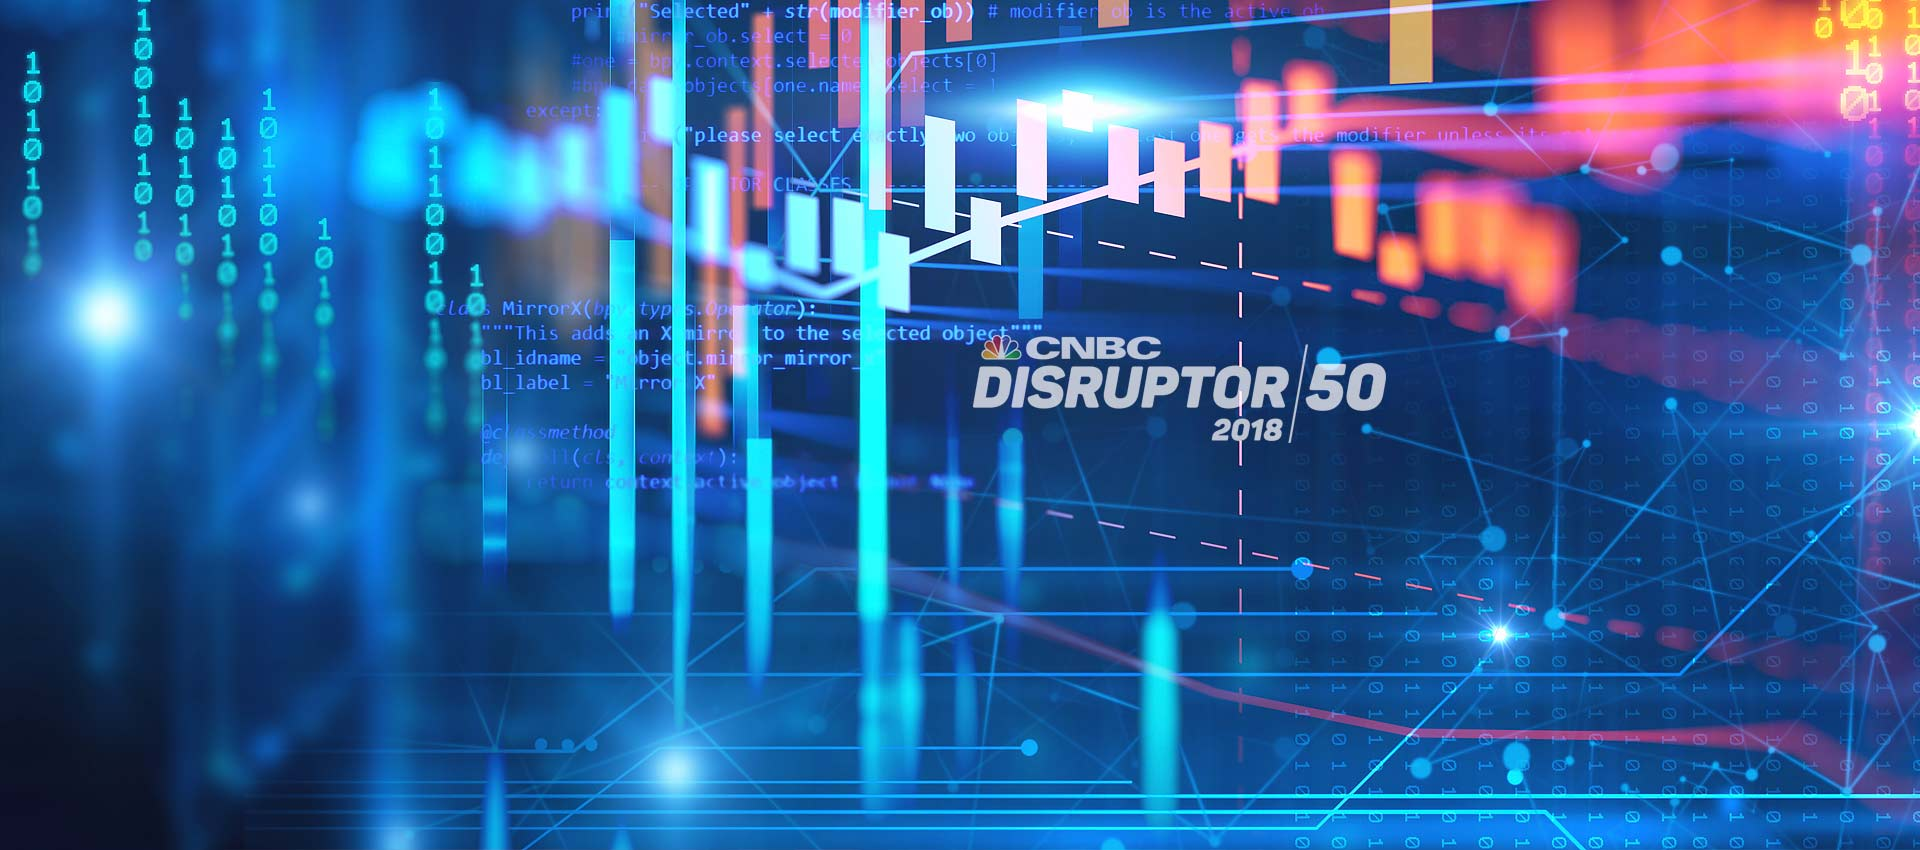 C3 - CNBC Disruptor 50